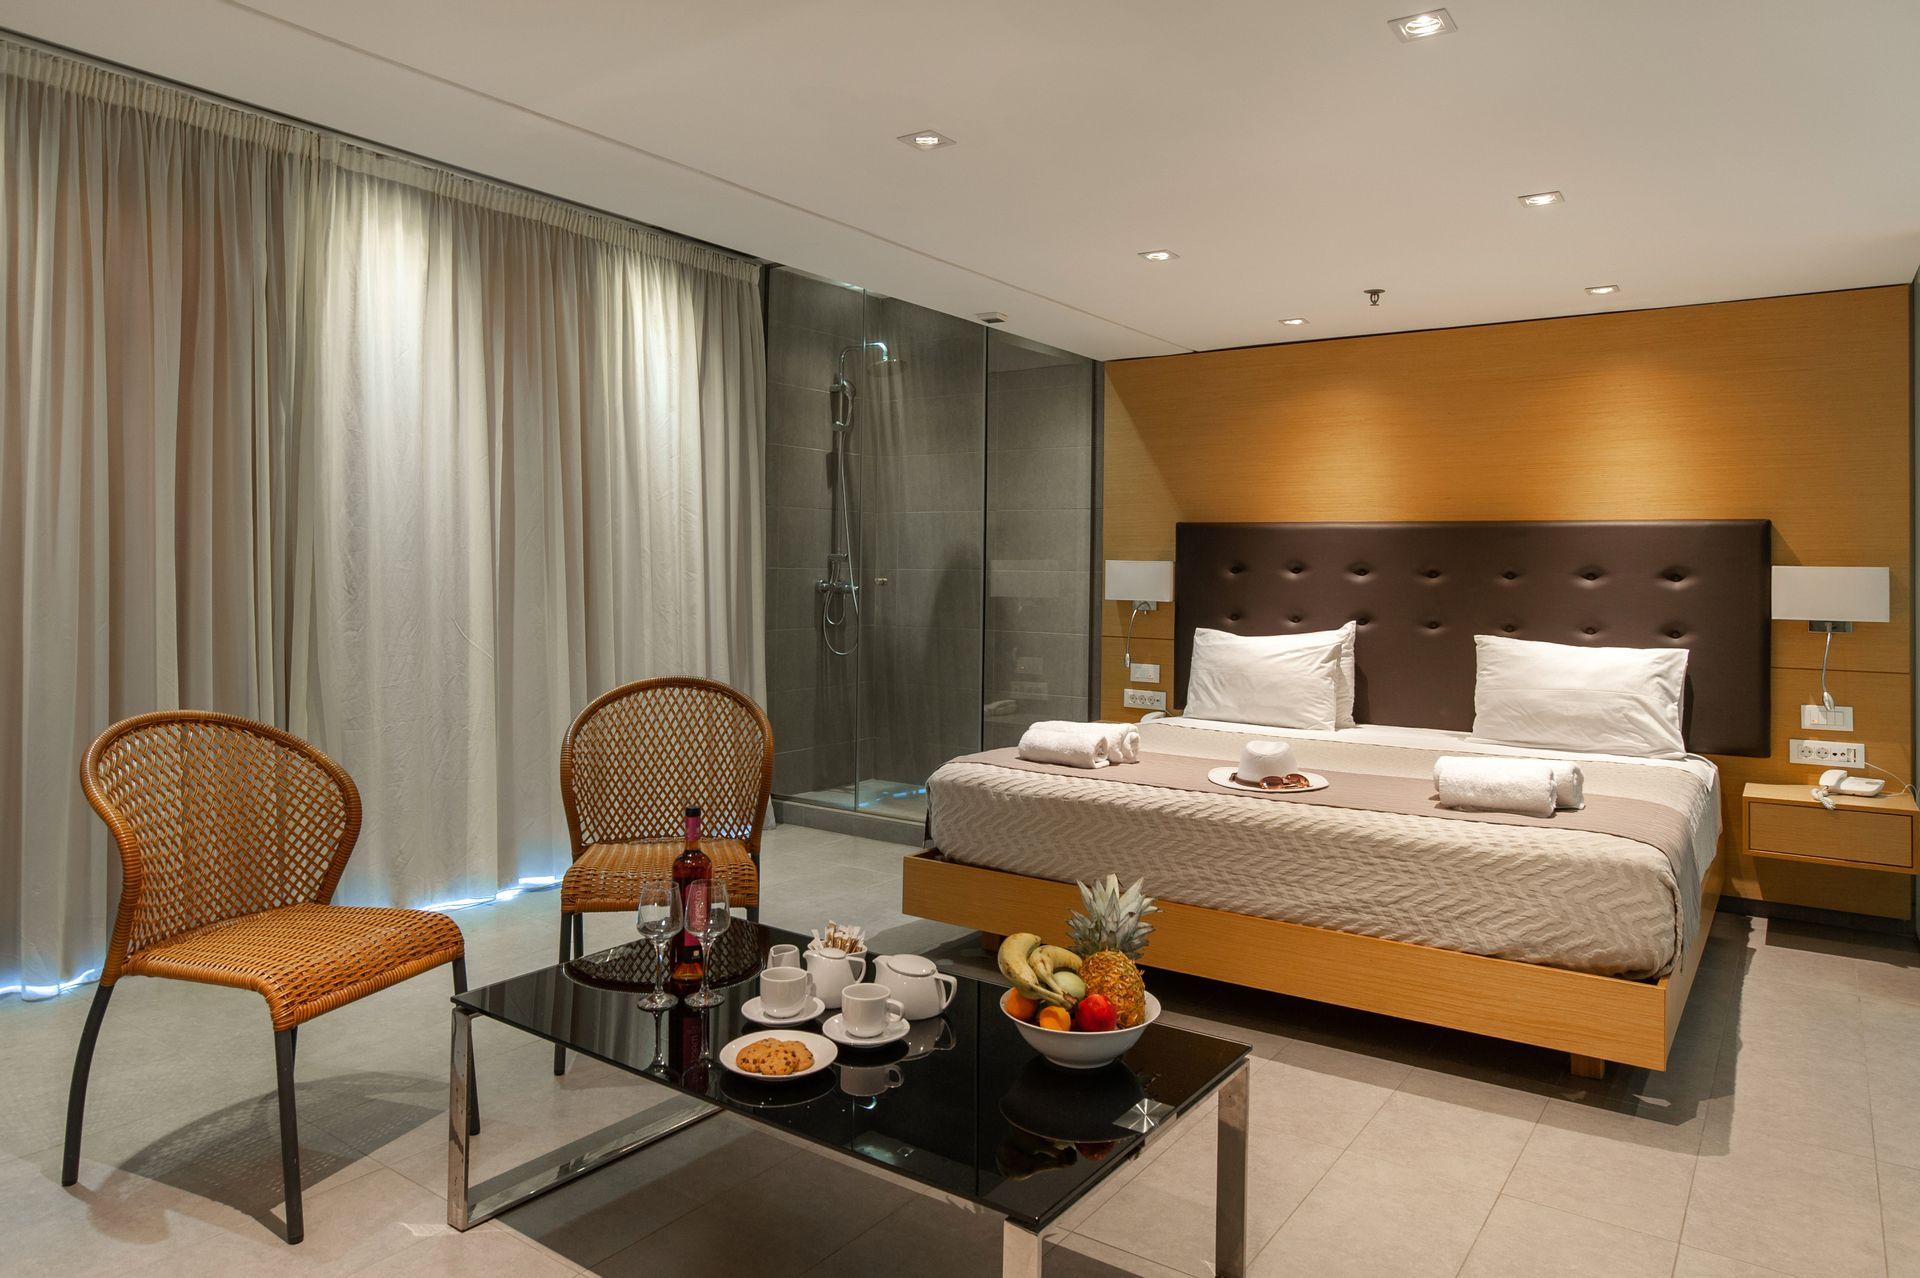 Atlantis City Hotel Rhodes - Ρόδος ✦ 2 Ημέρες (1 Διανυκτέρευση) ✦ 2 άτομα ✦ Χωρίς Πρωινό ✦ 01/09/2021 έως 30/09/2021 ✦ Στην πόλη της Ρόδου!